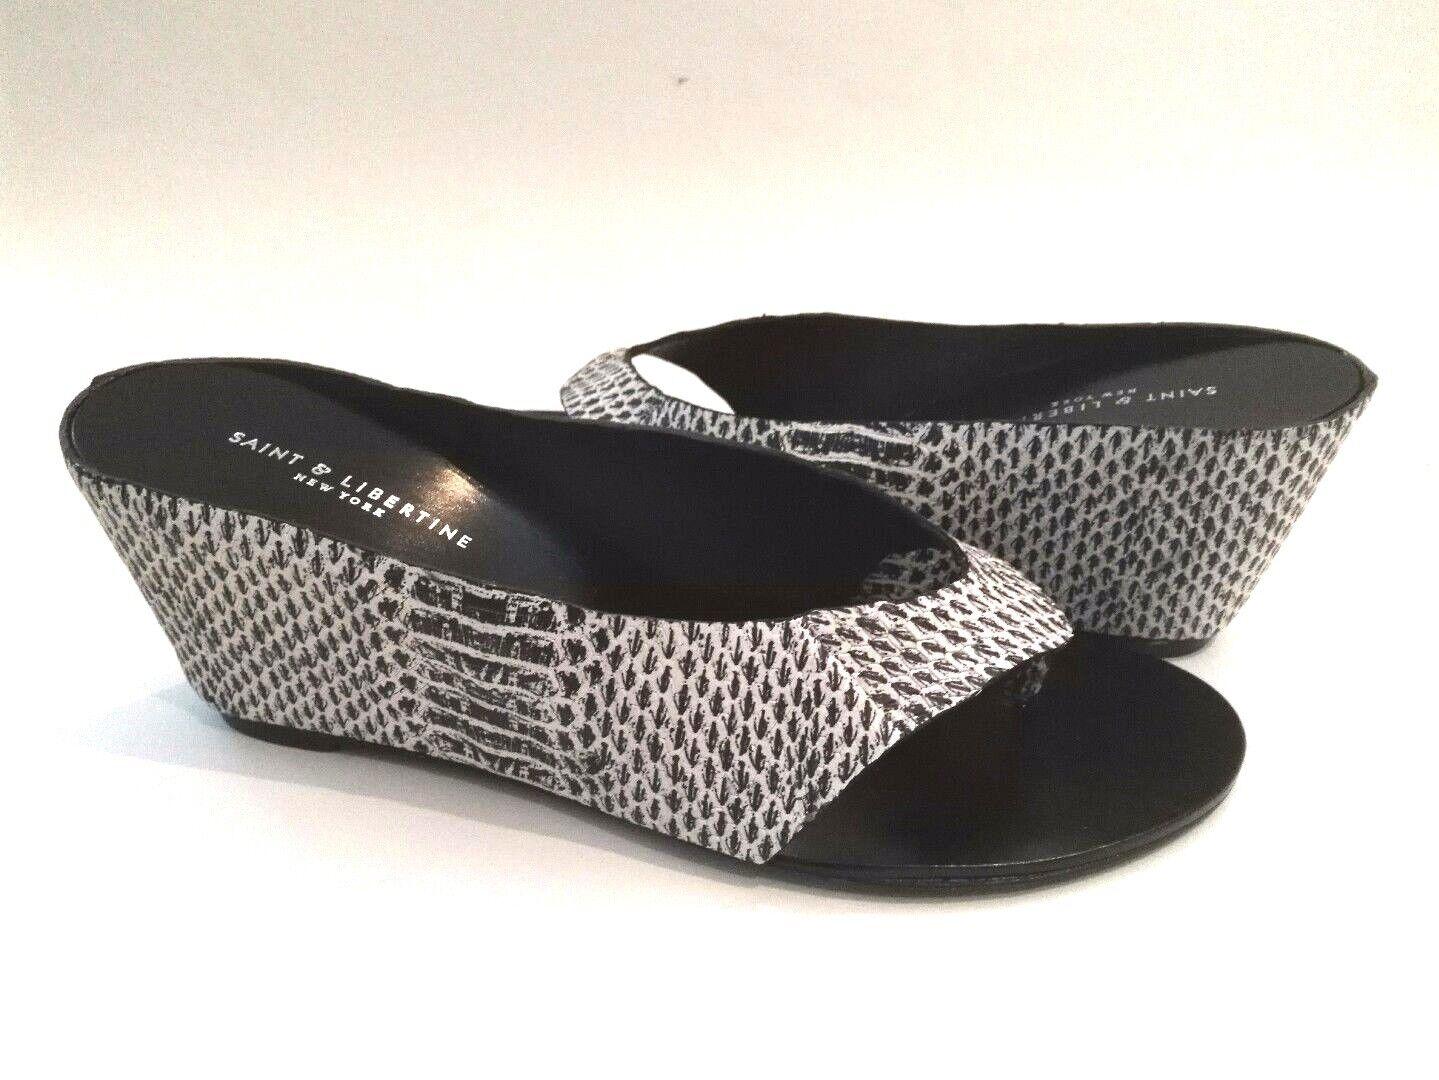 NEU  Saint & Libertine/Ivy Kirzhner PRINCE Wedge Leder Sandale Mule BLACK 225